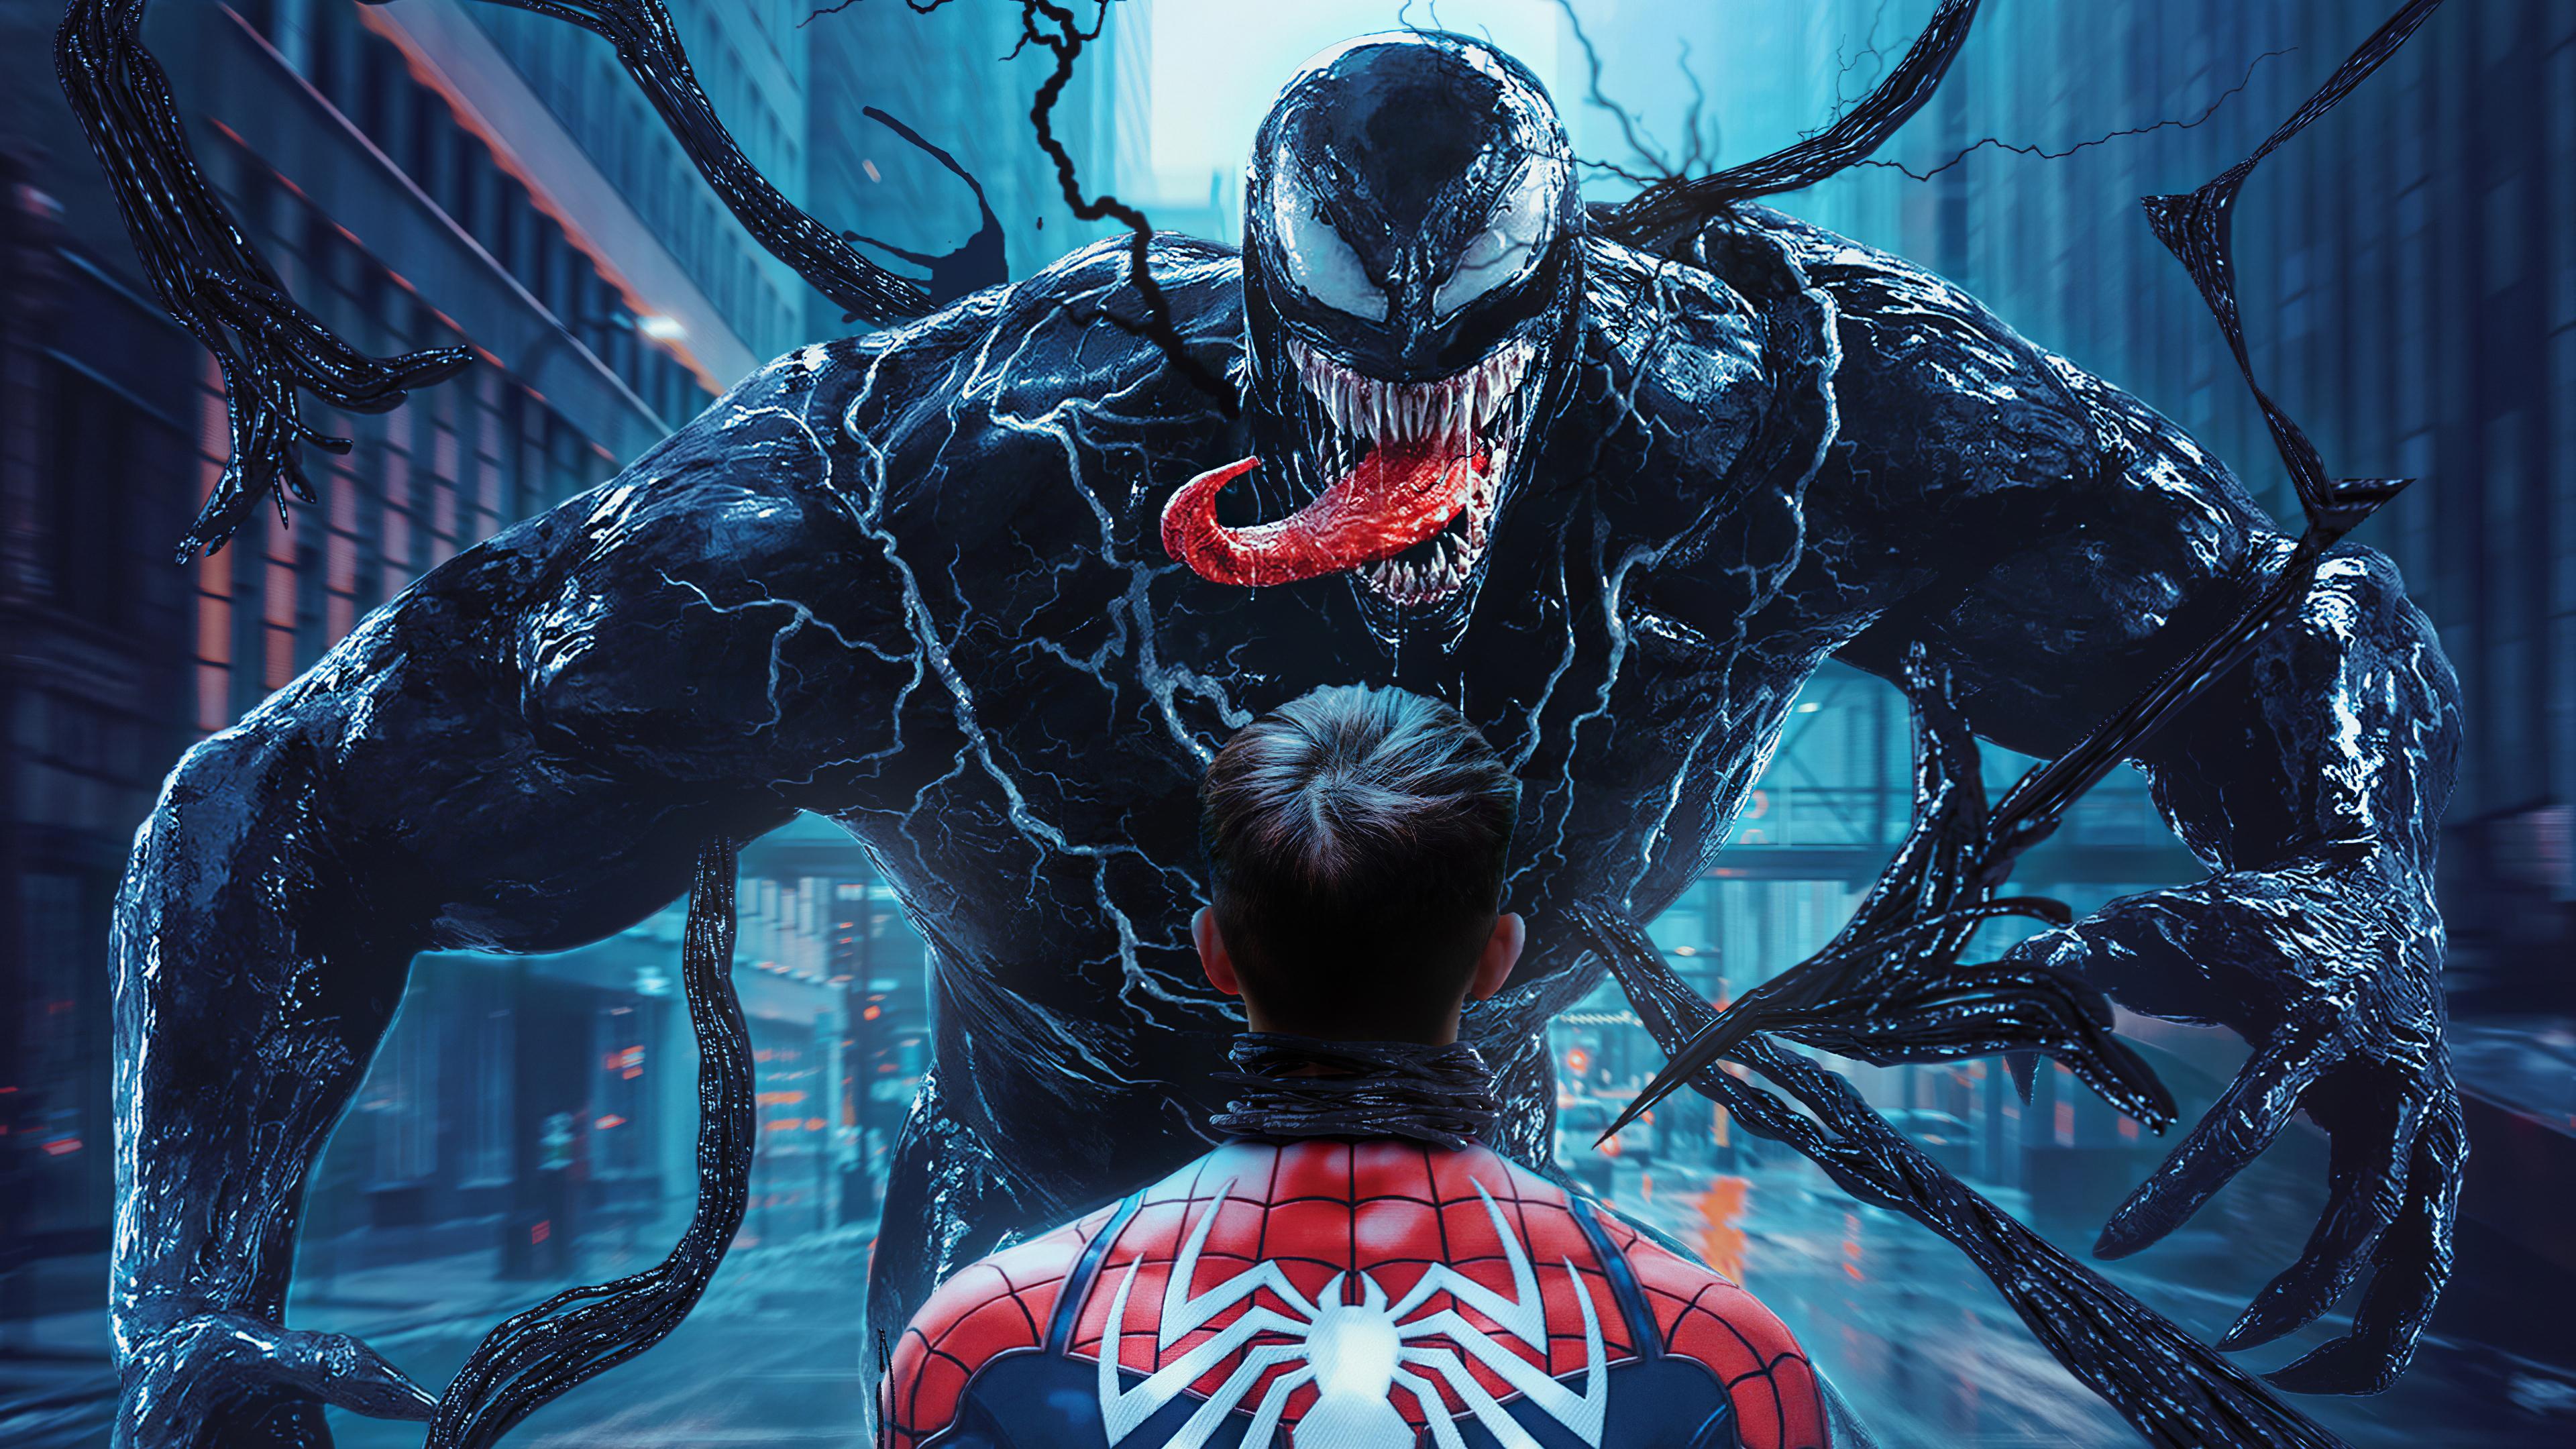 4k Spider Man Vs Venom, HD Superheroes, 4k Wallpapers ...